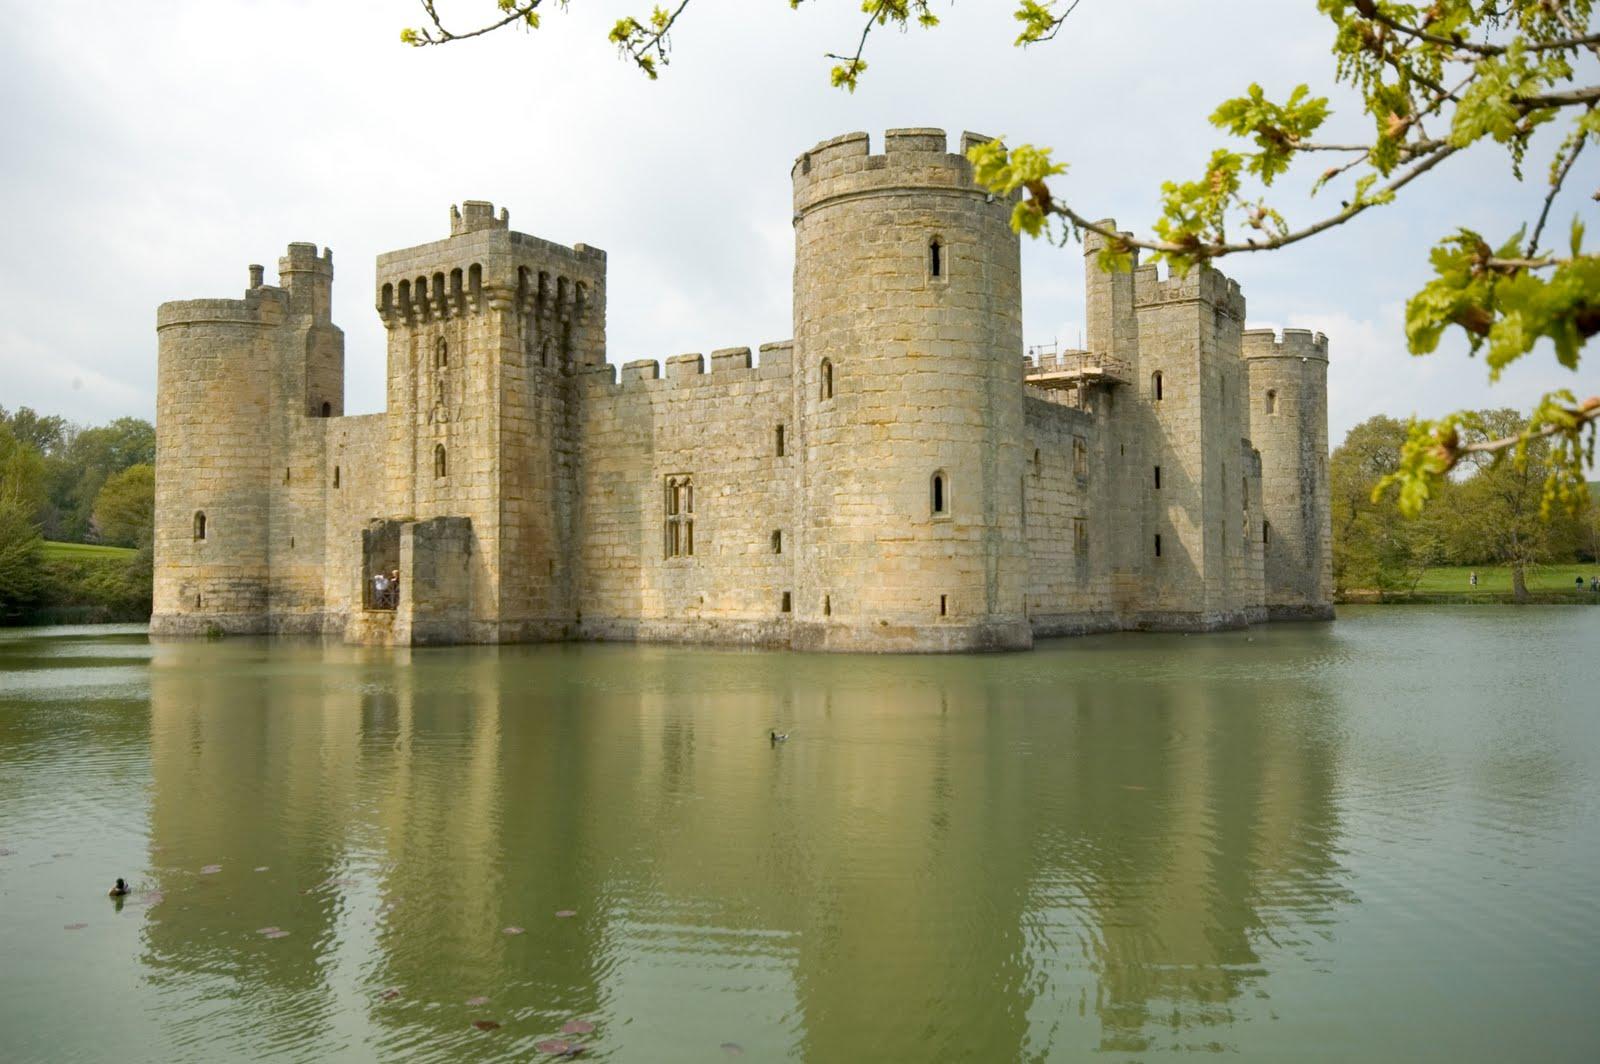 Castles in Europe: Bodiam